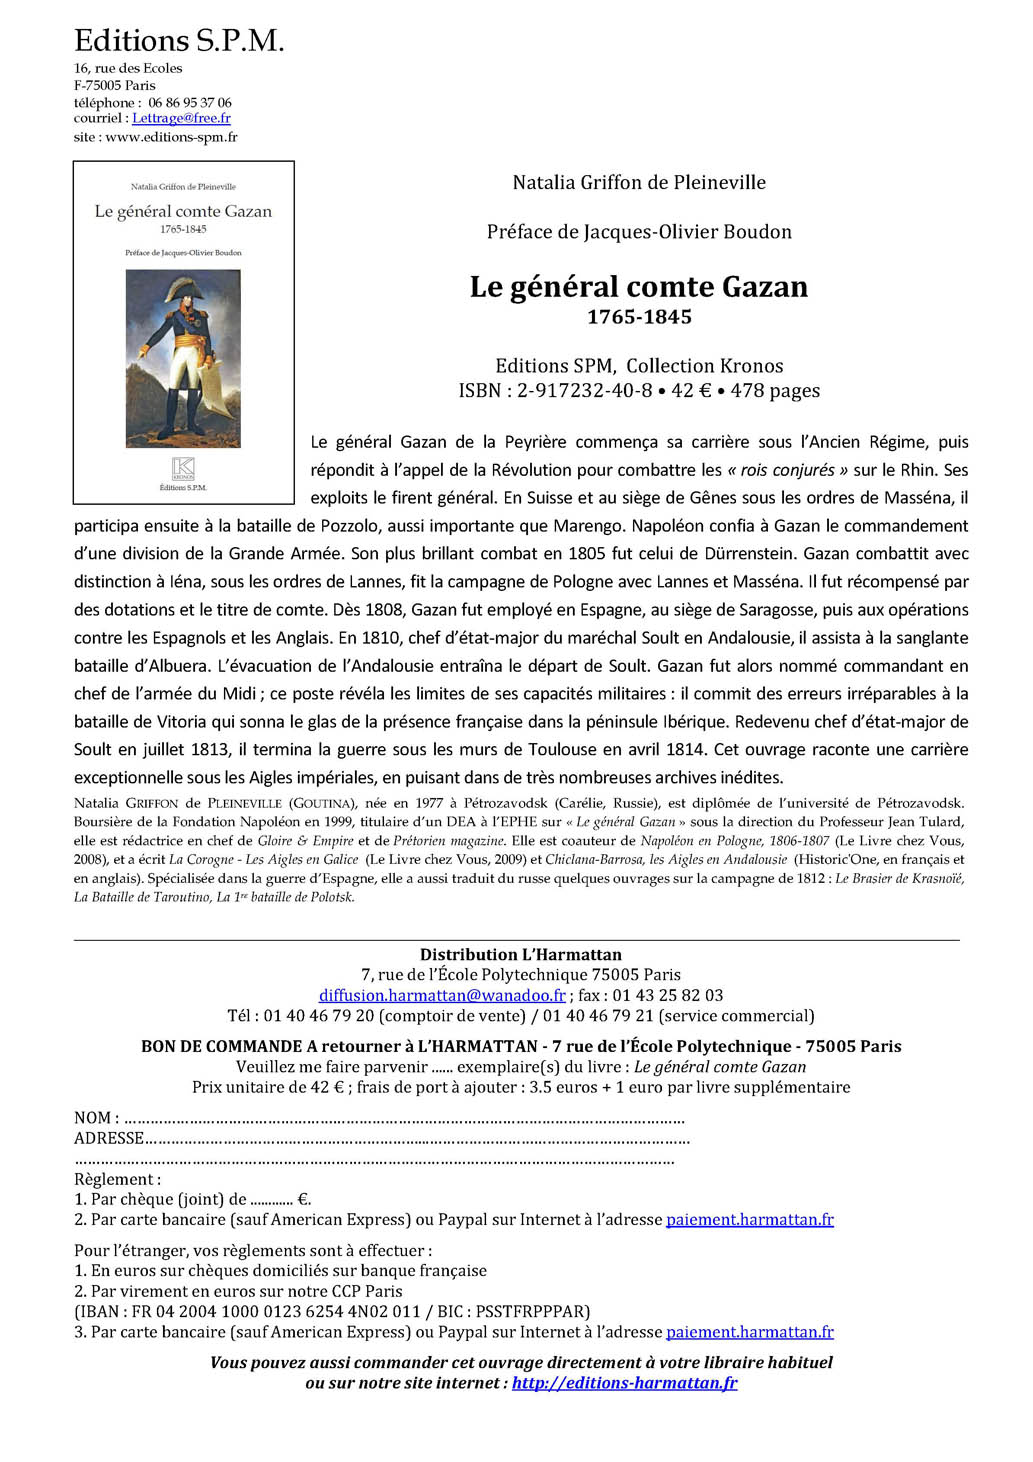 Biographie du Général Gazan Gazan